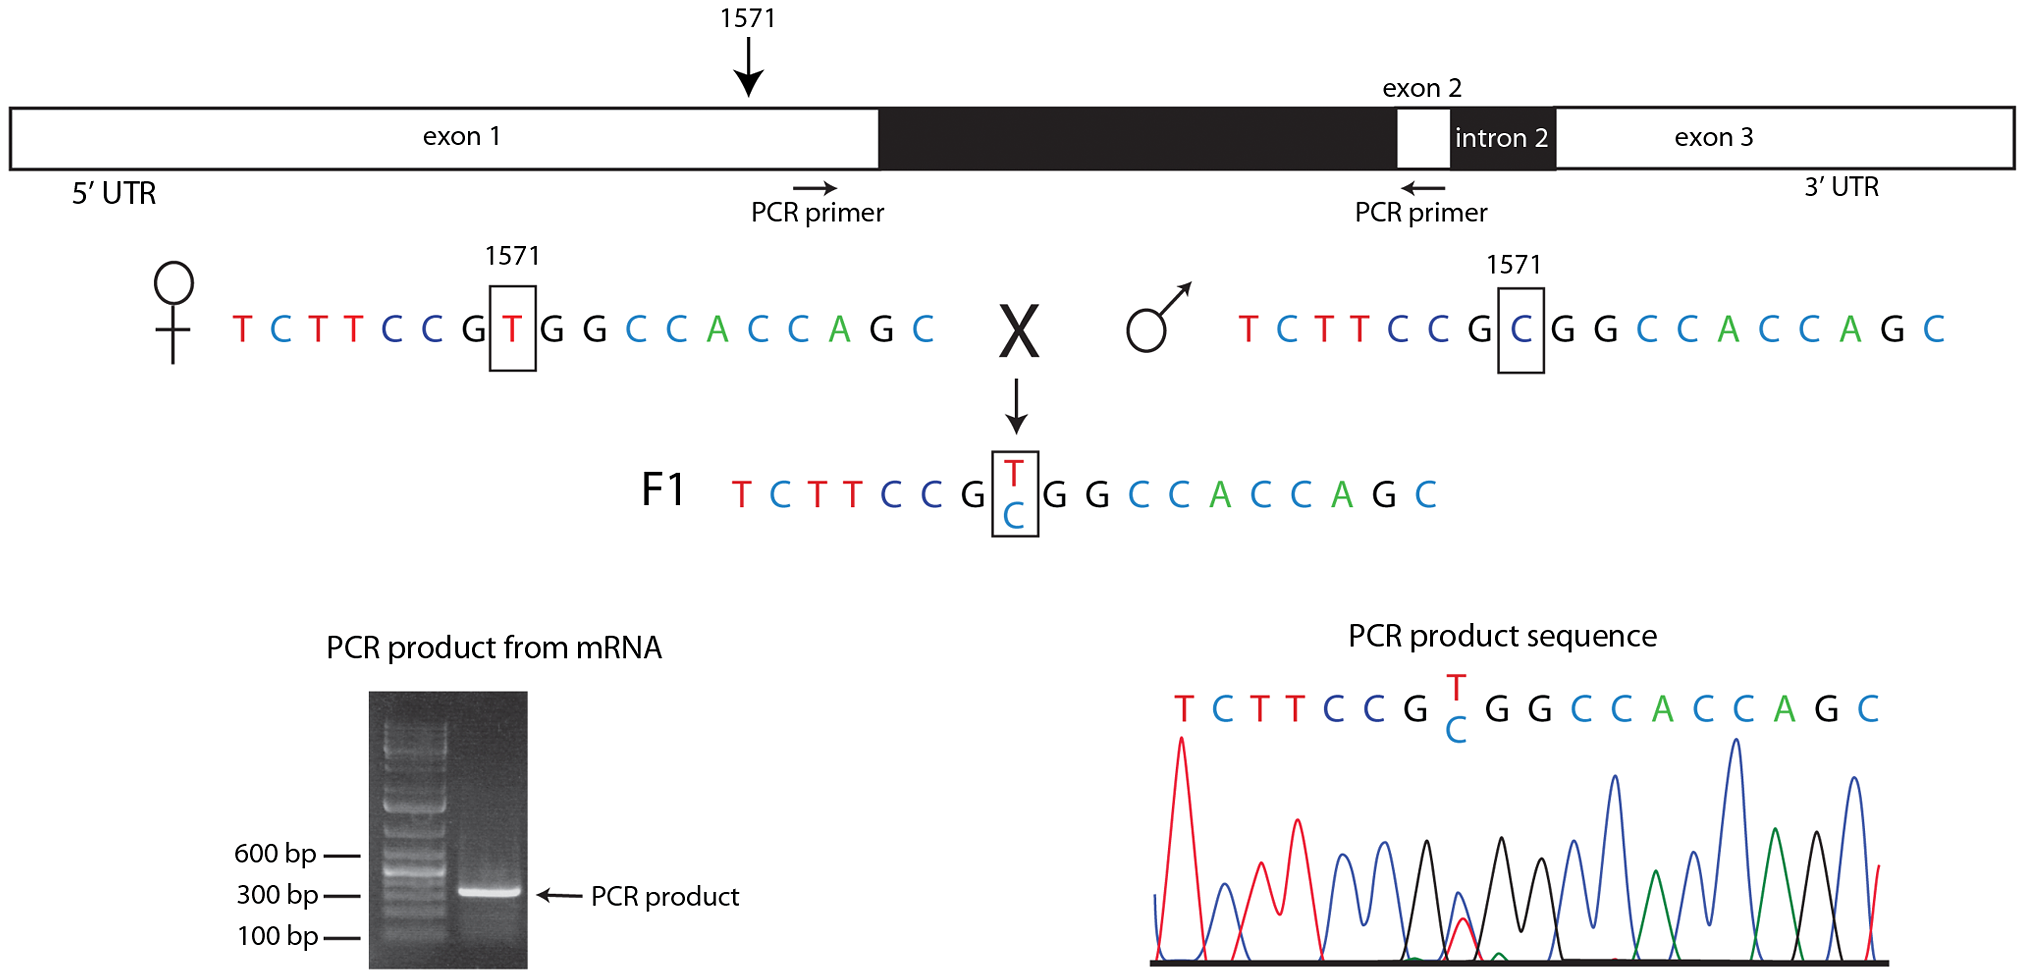 Both homologs express <i>engrailed</i> transcripts in pre-blastoderm embryos.